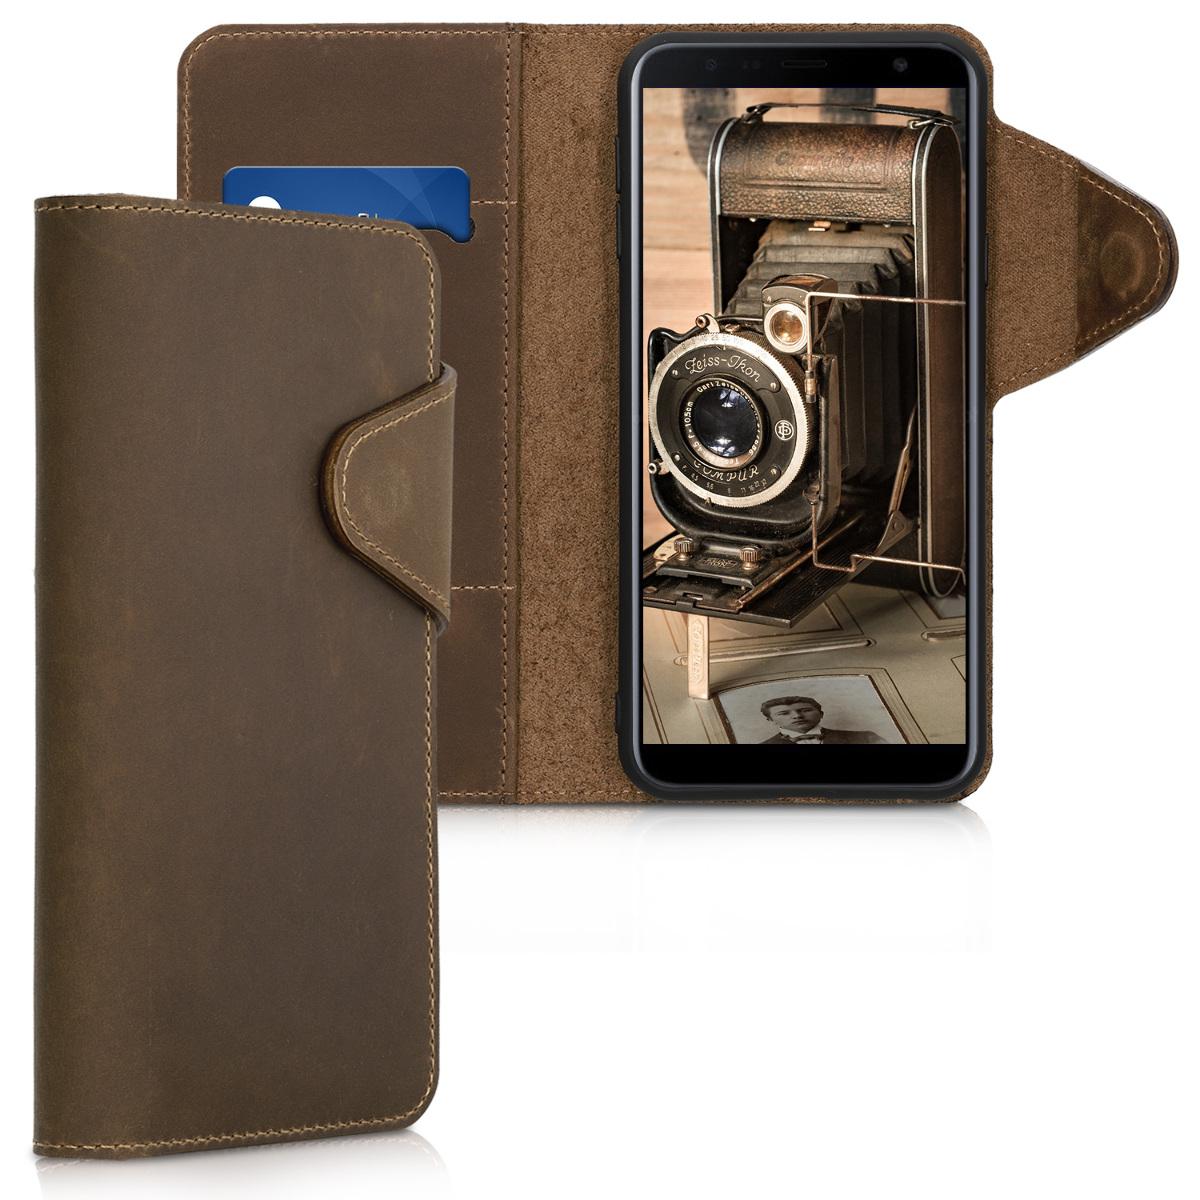 Kalibri Δερμάτινη Suede Θήκη - Πορτοφόλι Samsung Galaxy J4 Plus - Brown (46603.05)